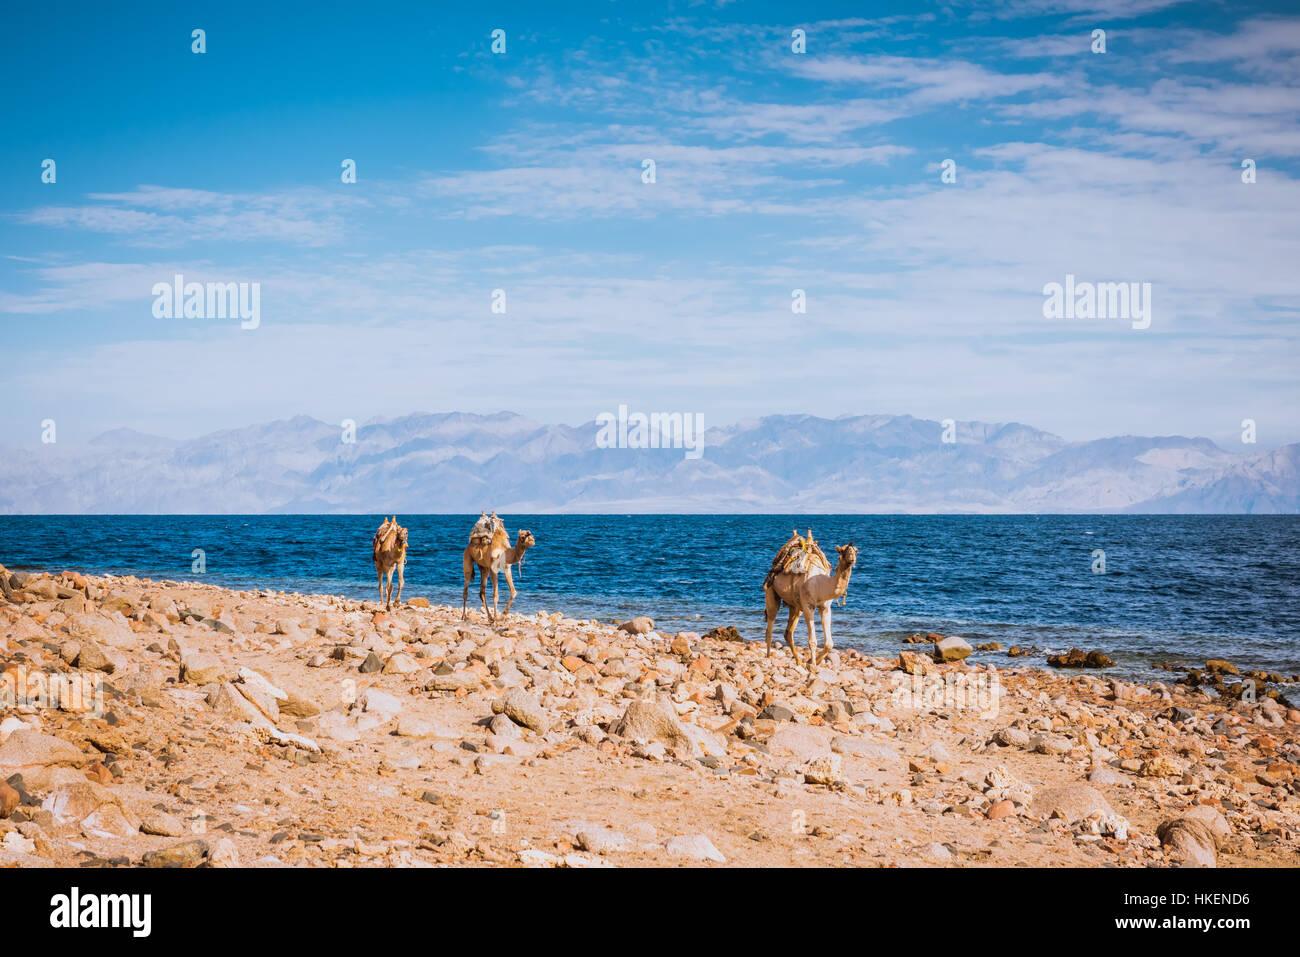 Camels on desert beach coast Sinai, Egypt, Africa - Stock Image